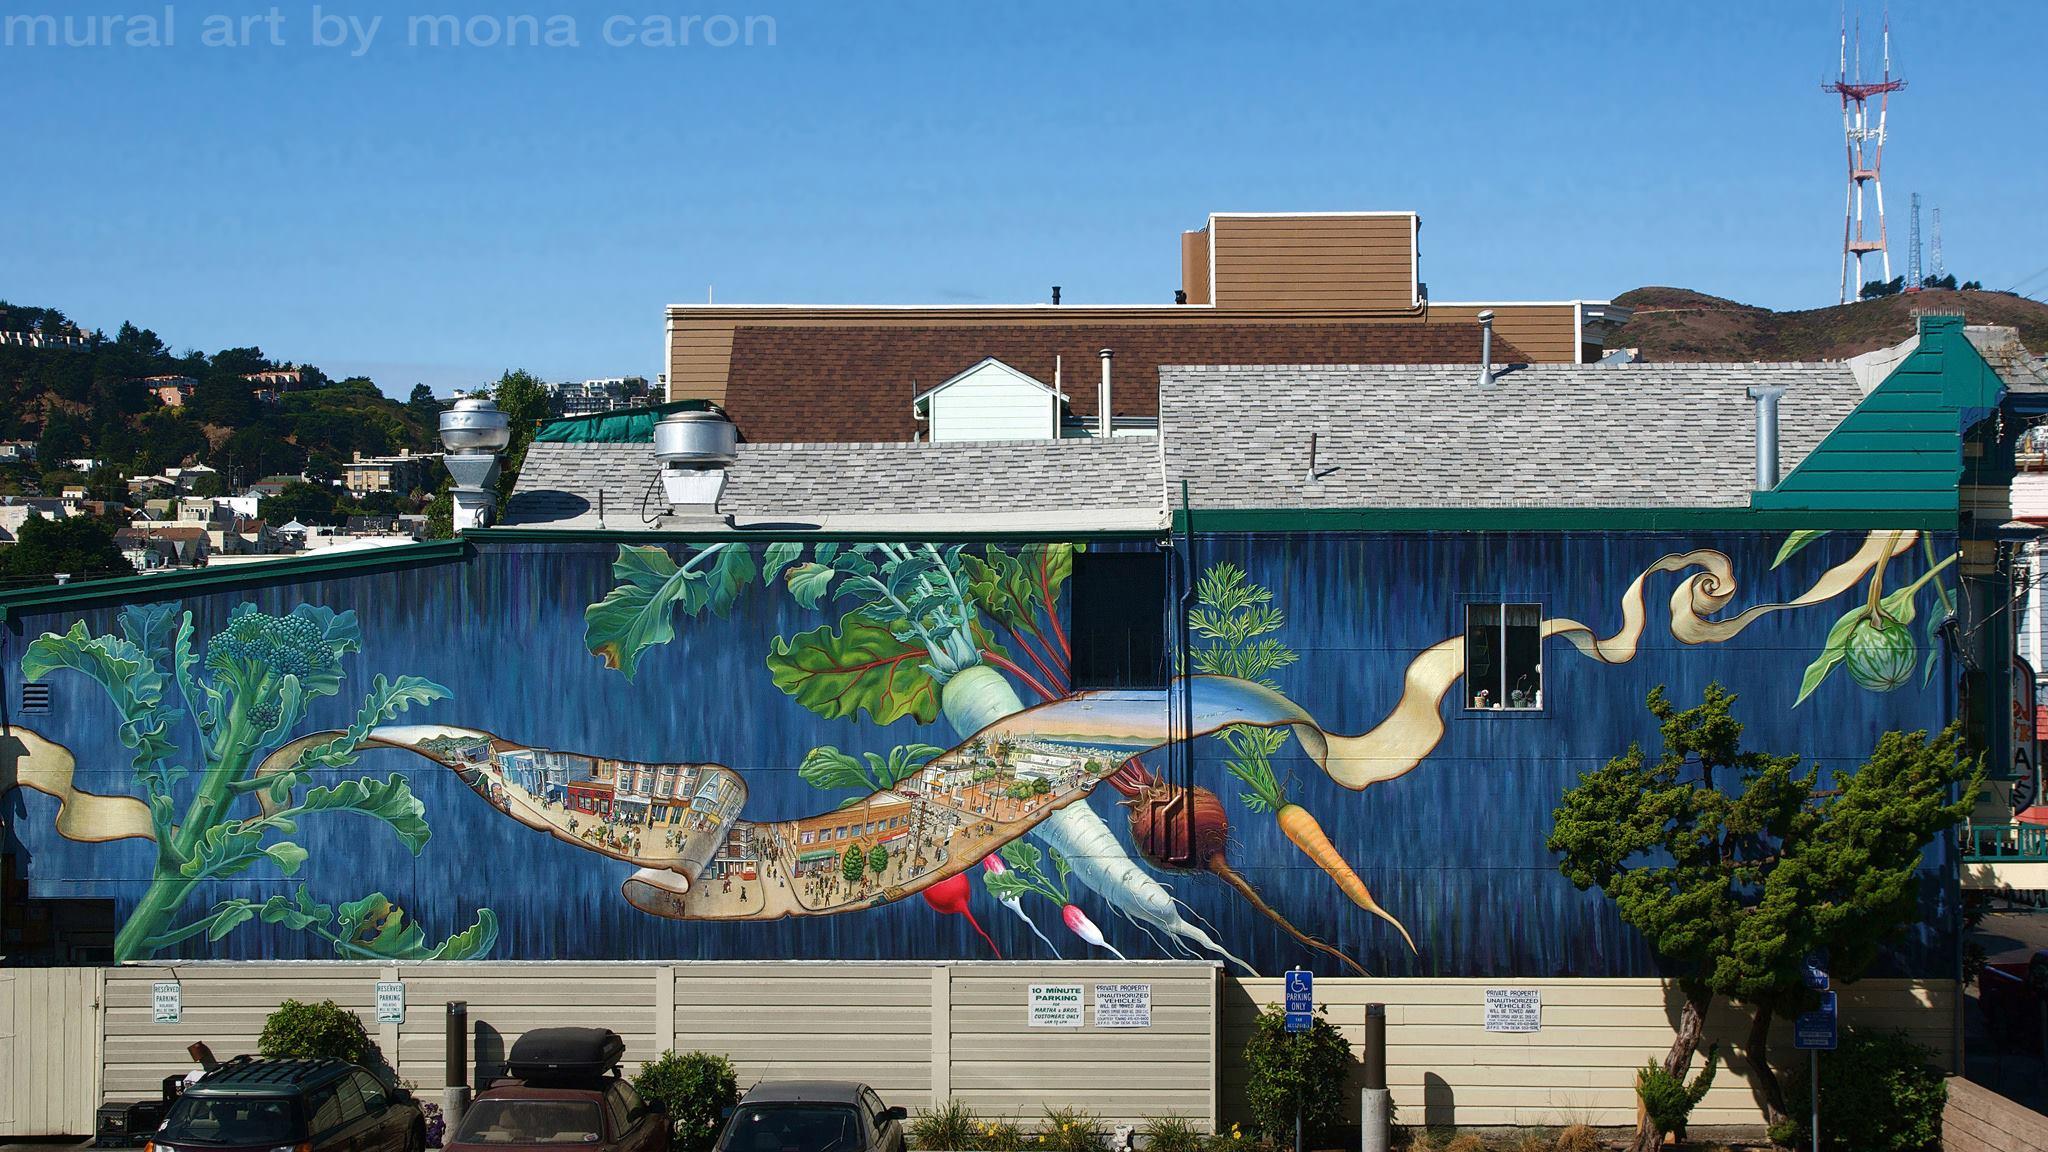 mona caron graffiti mural weeds (26)